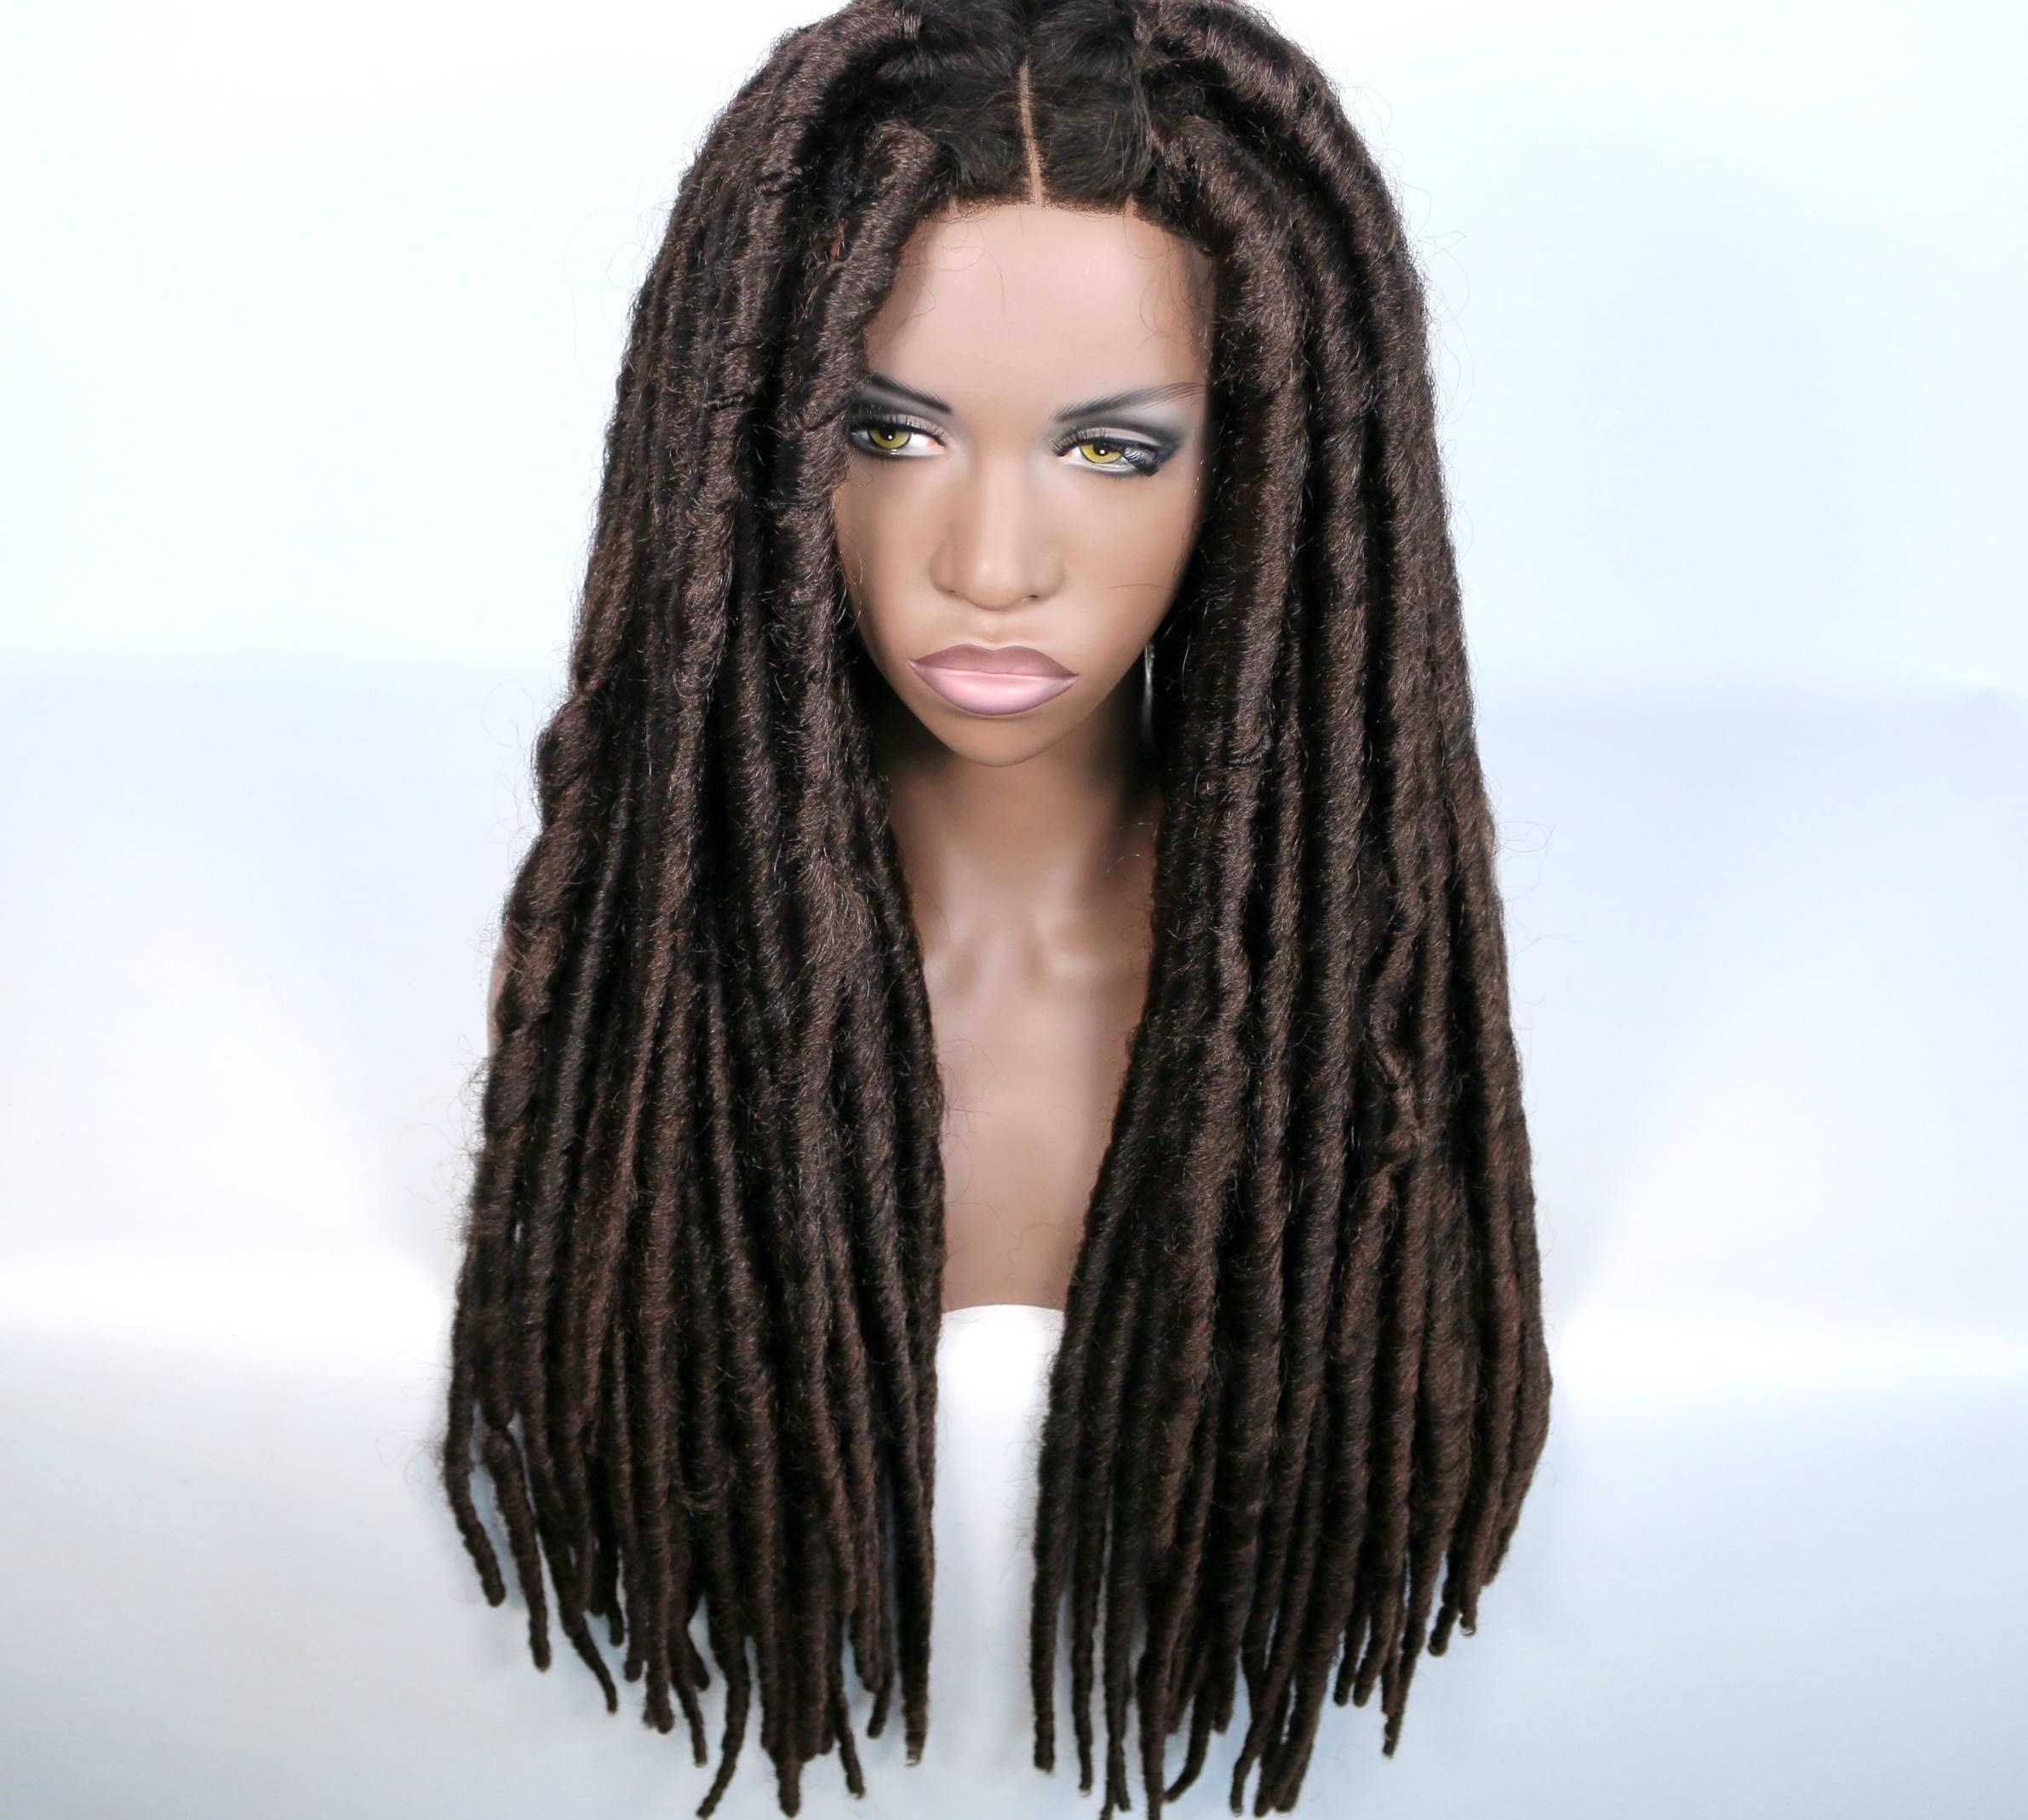 SALE Brown Dreadlocks Extra Faux Locs Crochet wig w Closure